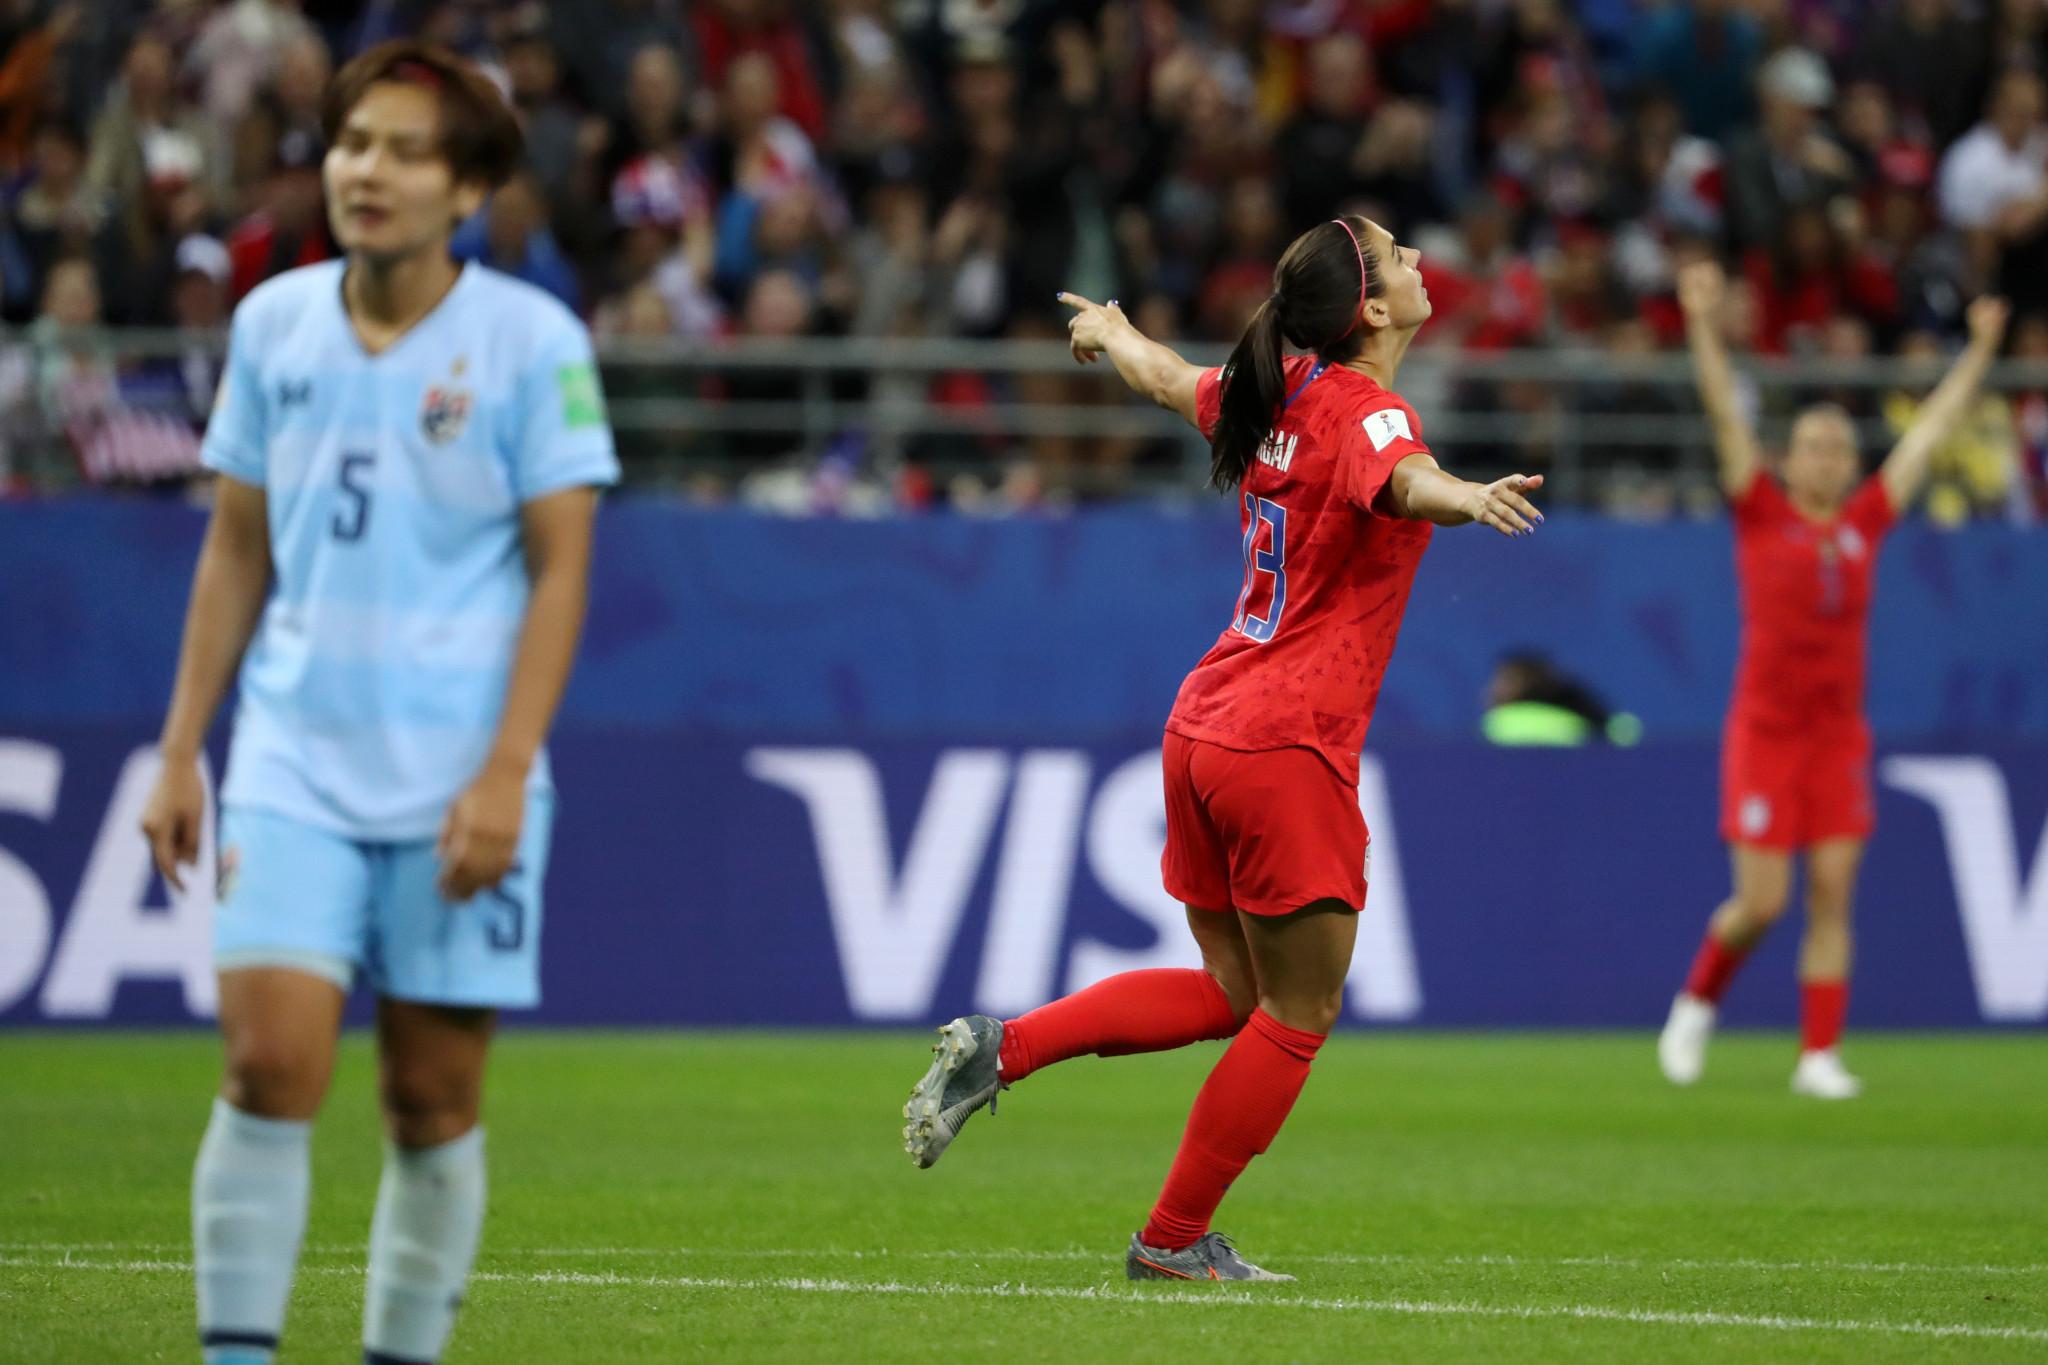 Alex Morgan scored five goals in America's 13-0 annihilation of Thailand ©Getty Images